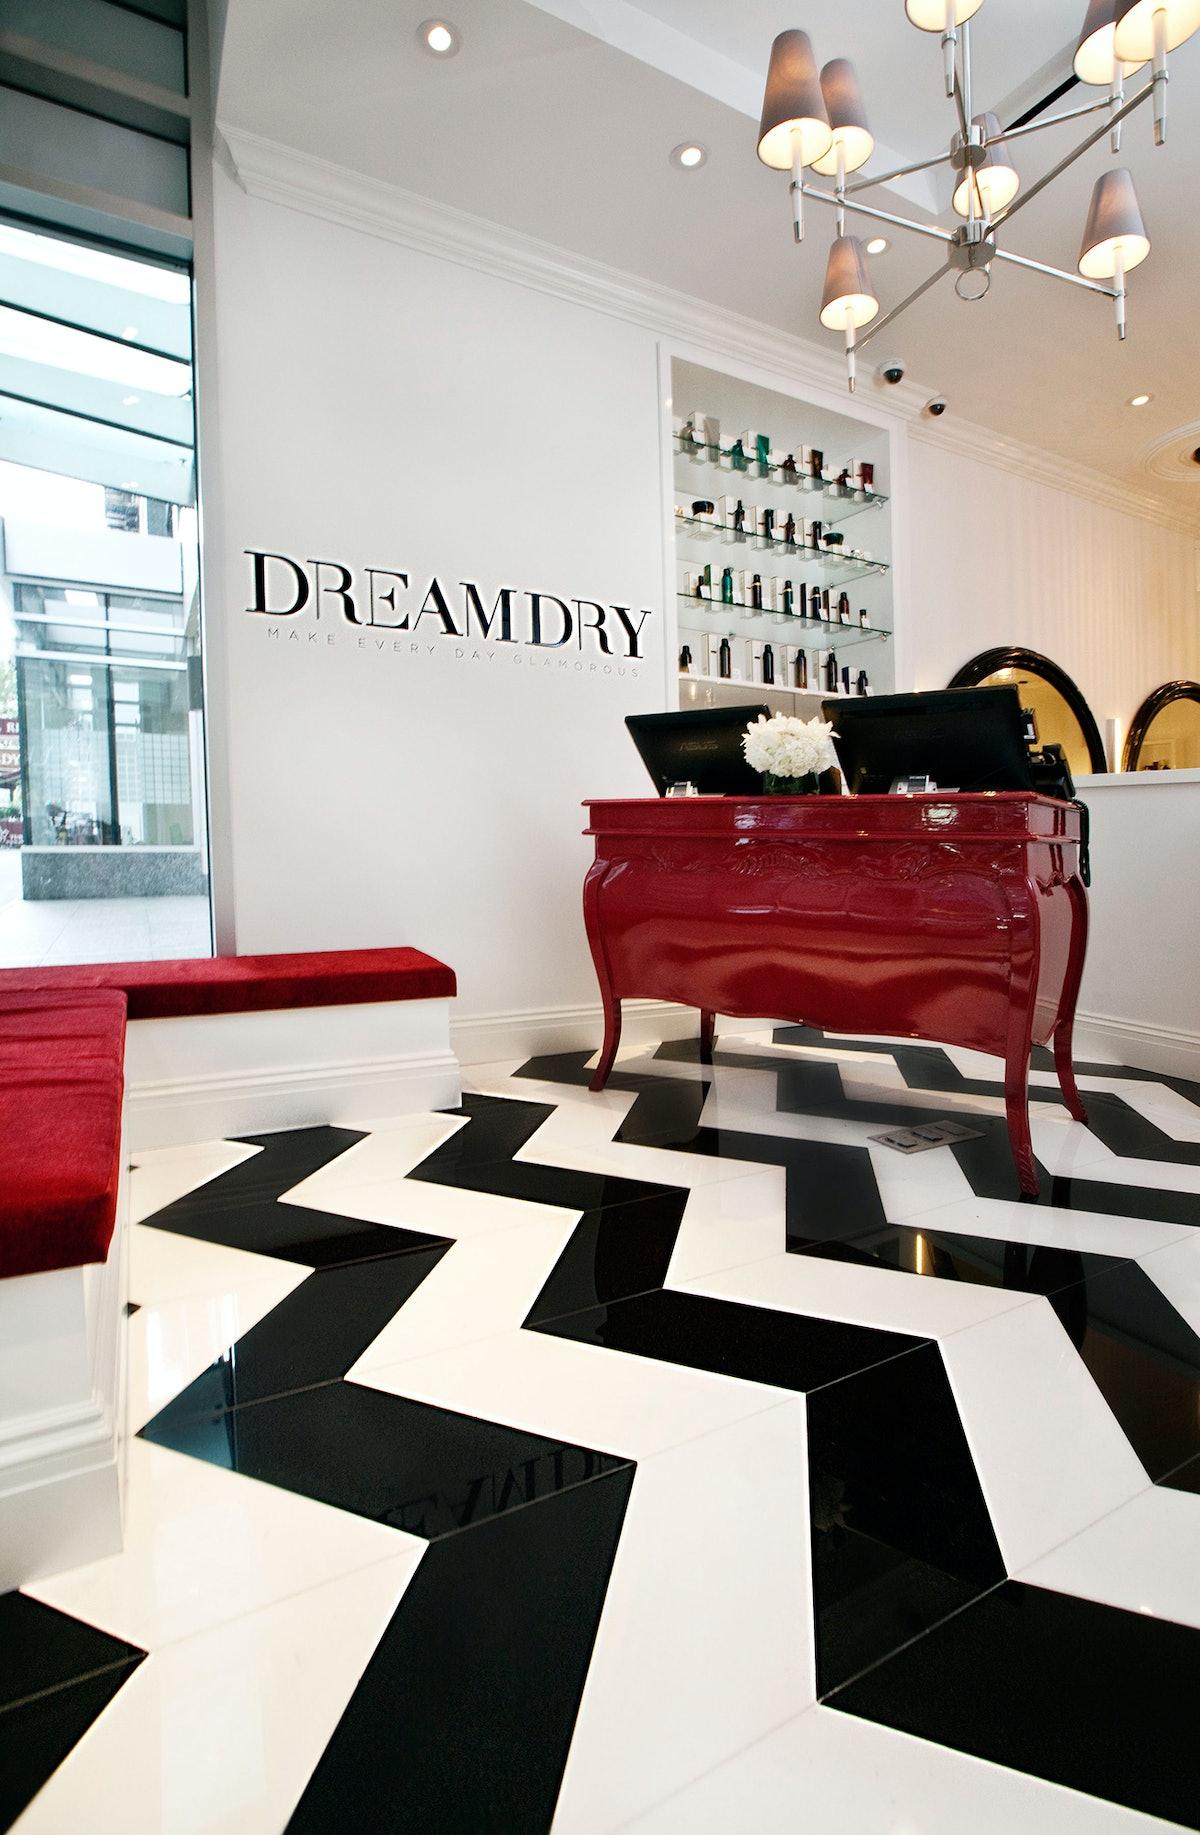 DreamDry 57th St